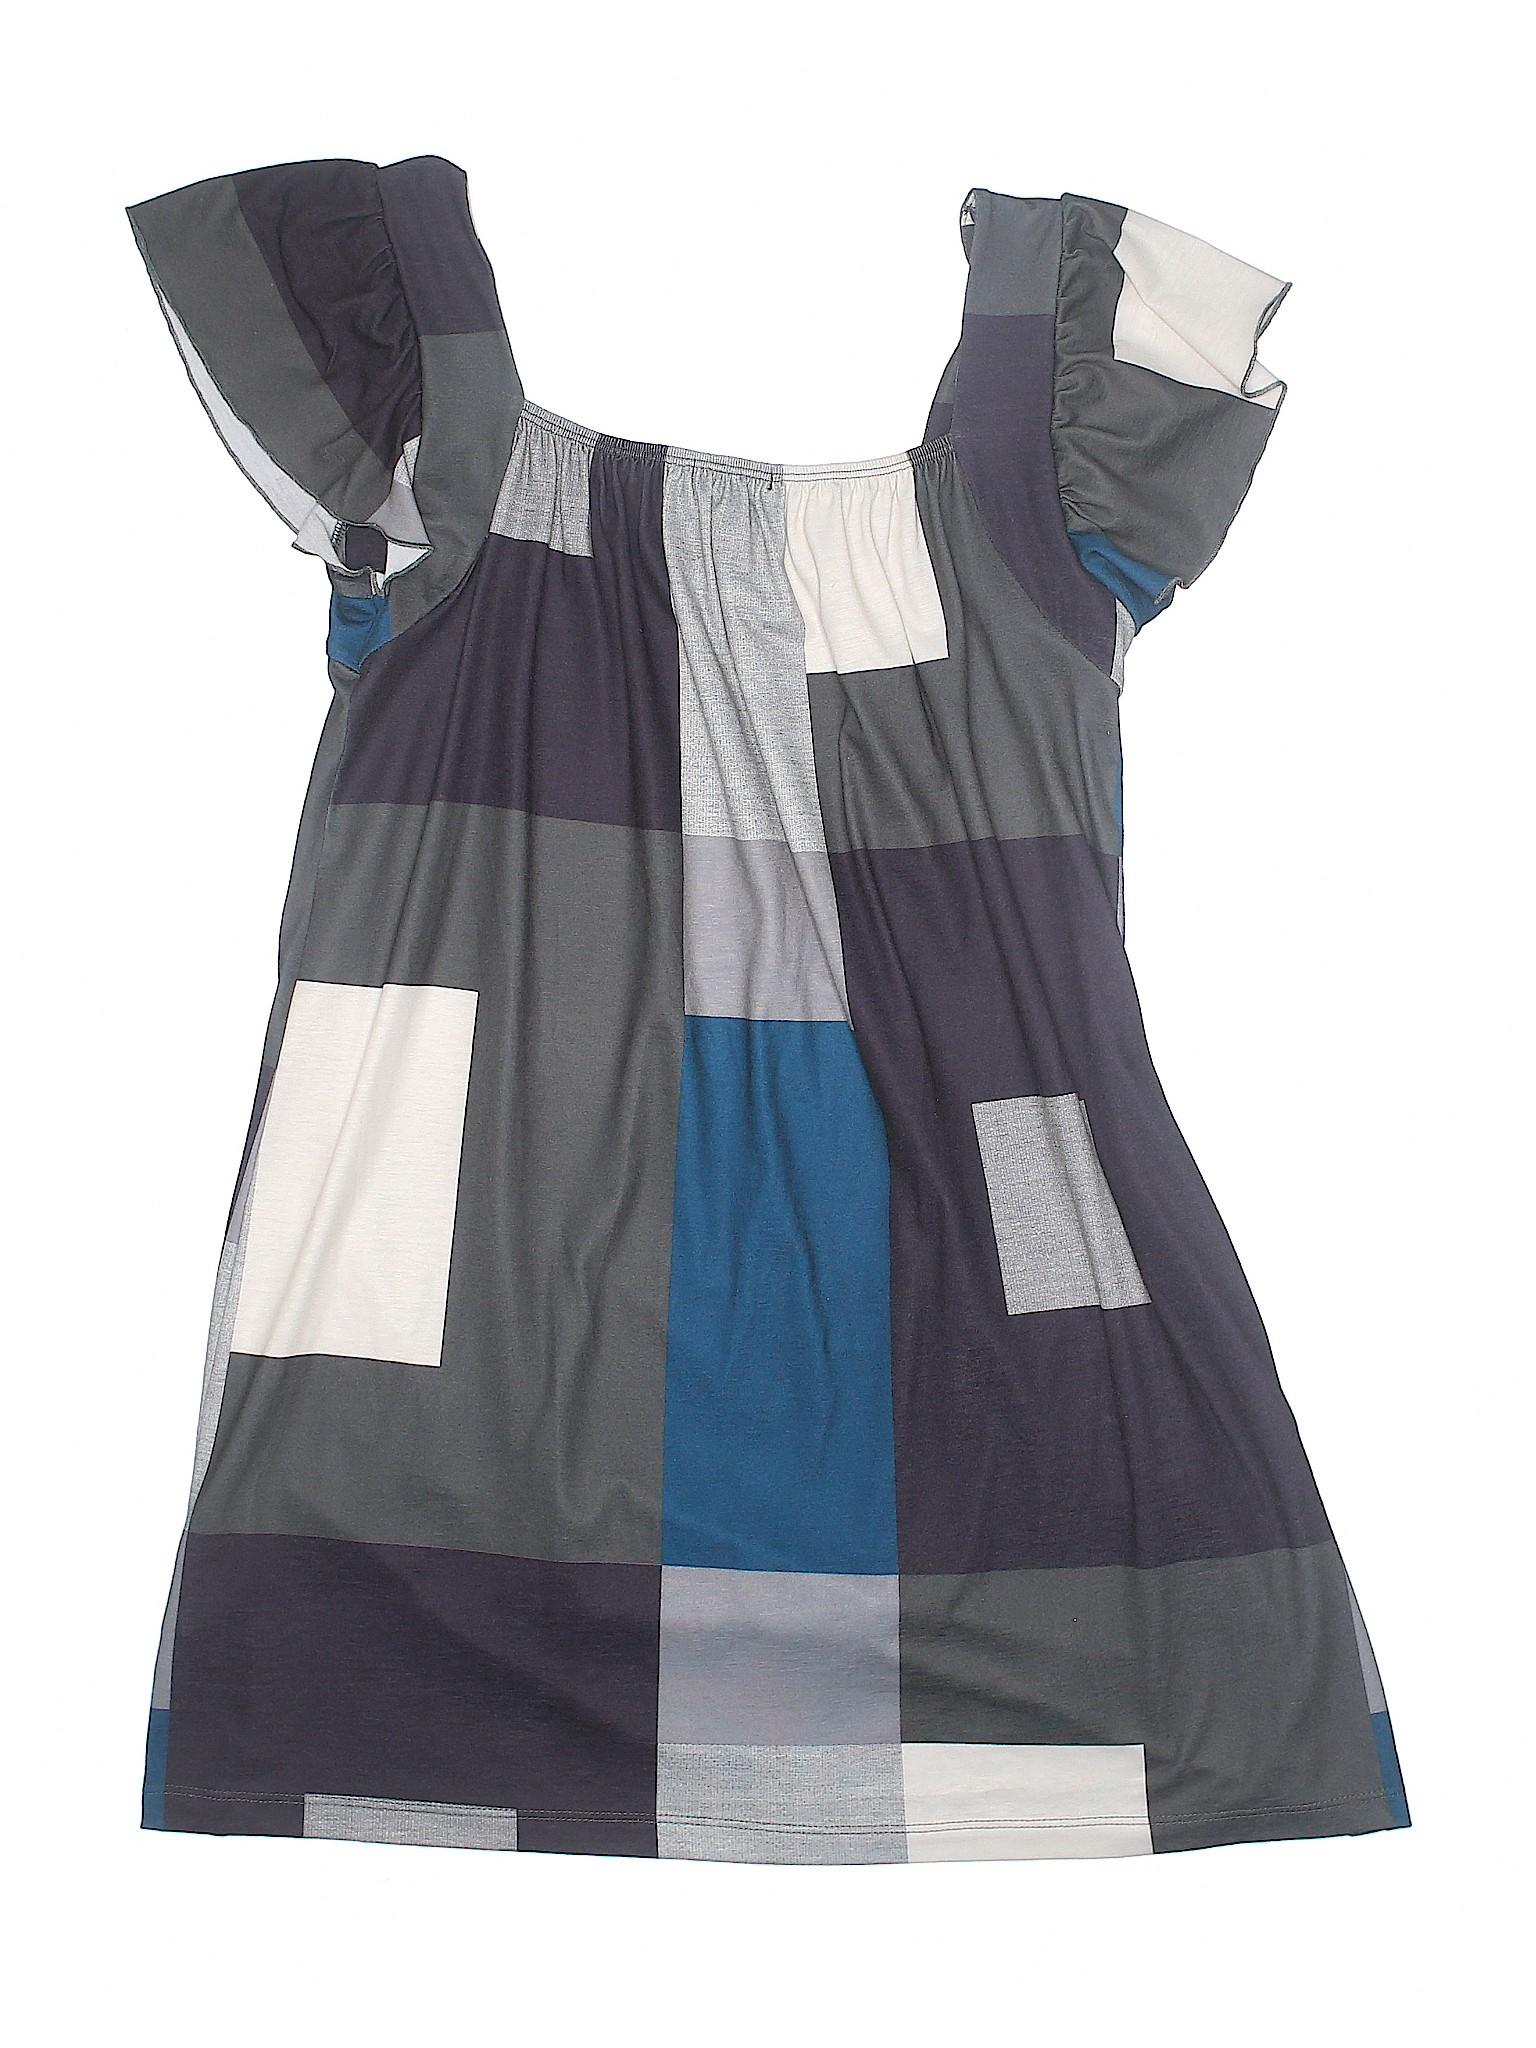 Casual H Boutique Dress amp;M winter qzwzUa4